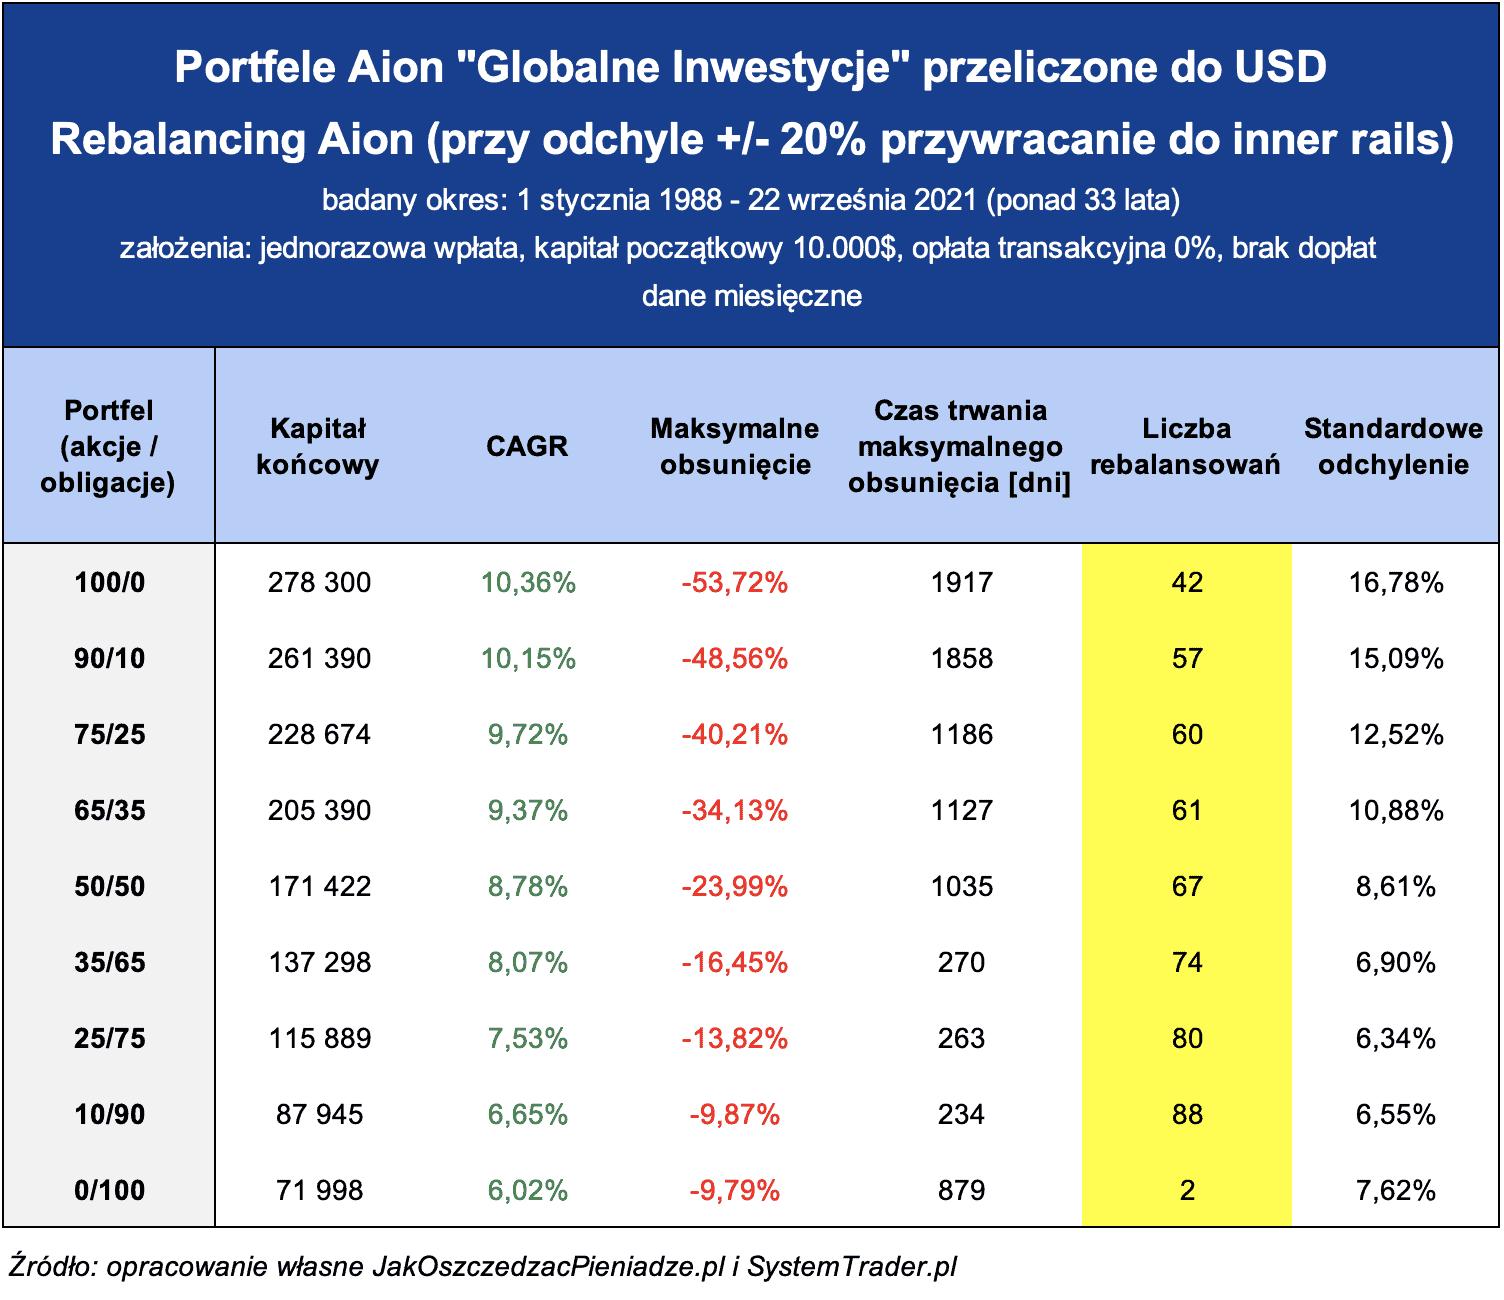 Aion Globalne Inwestycje USD rebalancing Aion